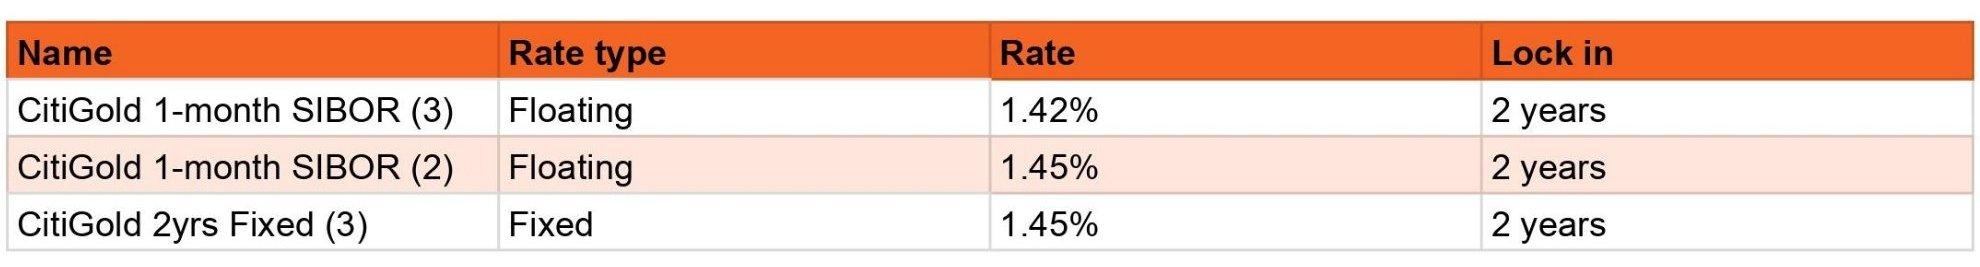 Citibank HDB Home Loan Rates